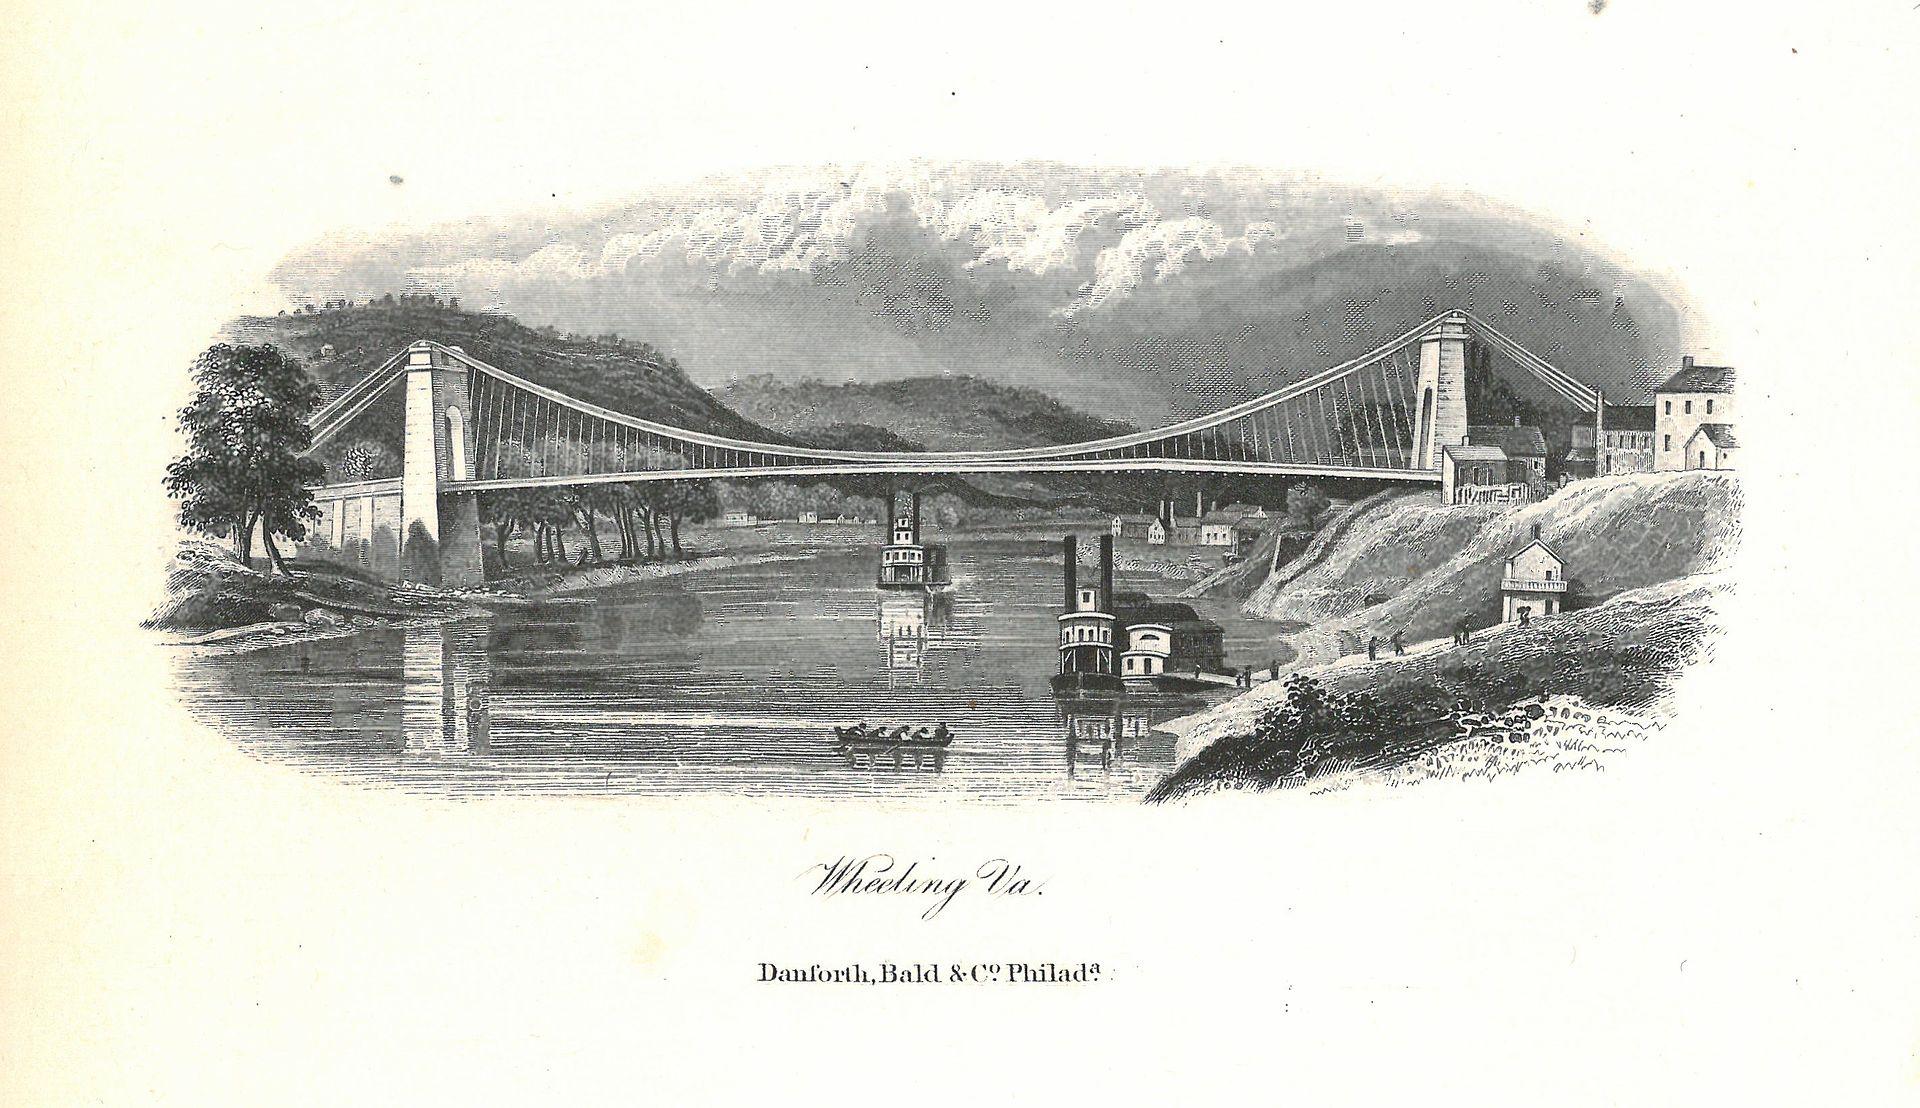 31AUG1852: Congress declares #WheelingSuspensionBridge a post road, saving it from demolition. #ASCE landmark; 1st bridge to span #OhioRiver https://t.co/zKzCYPb19P